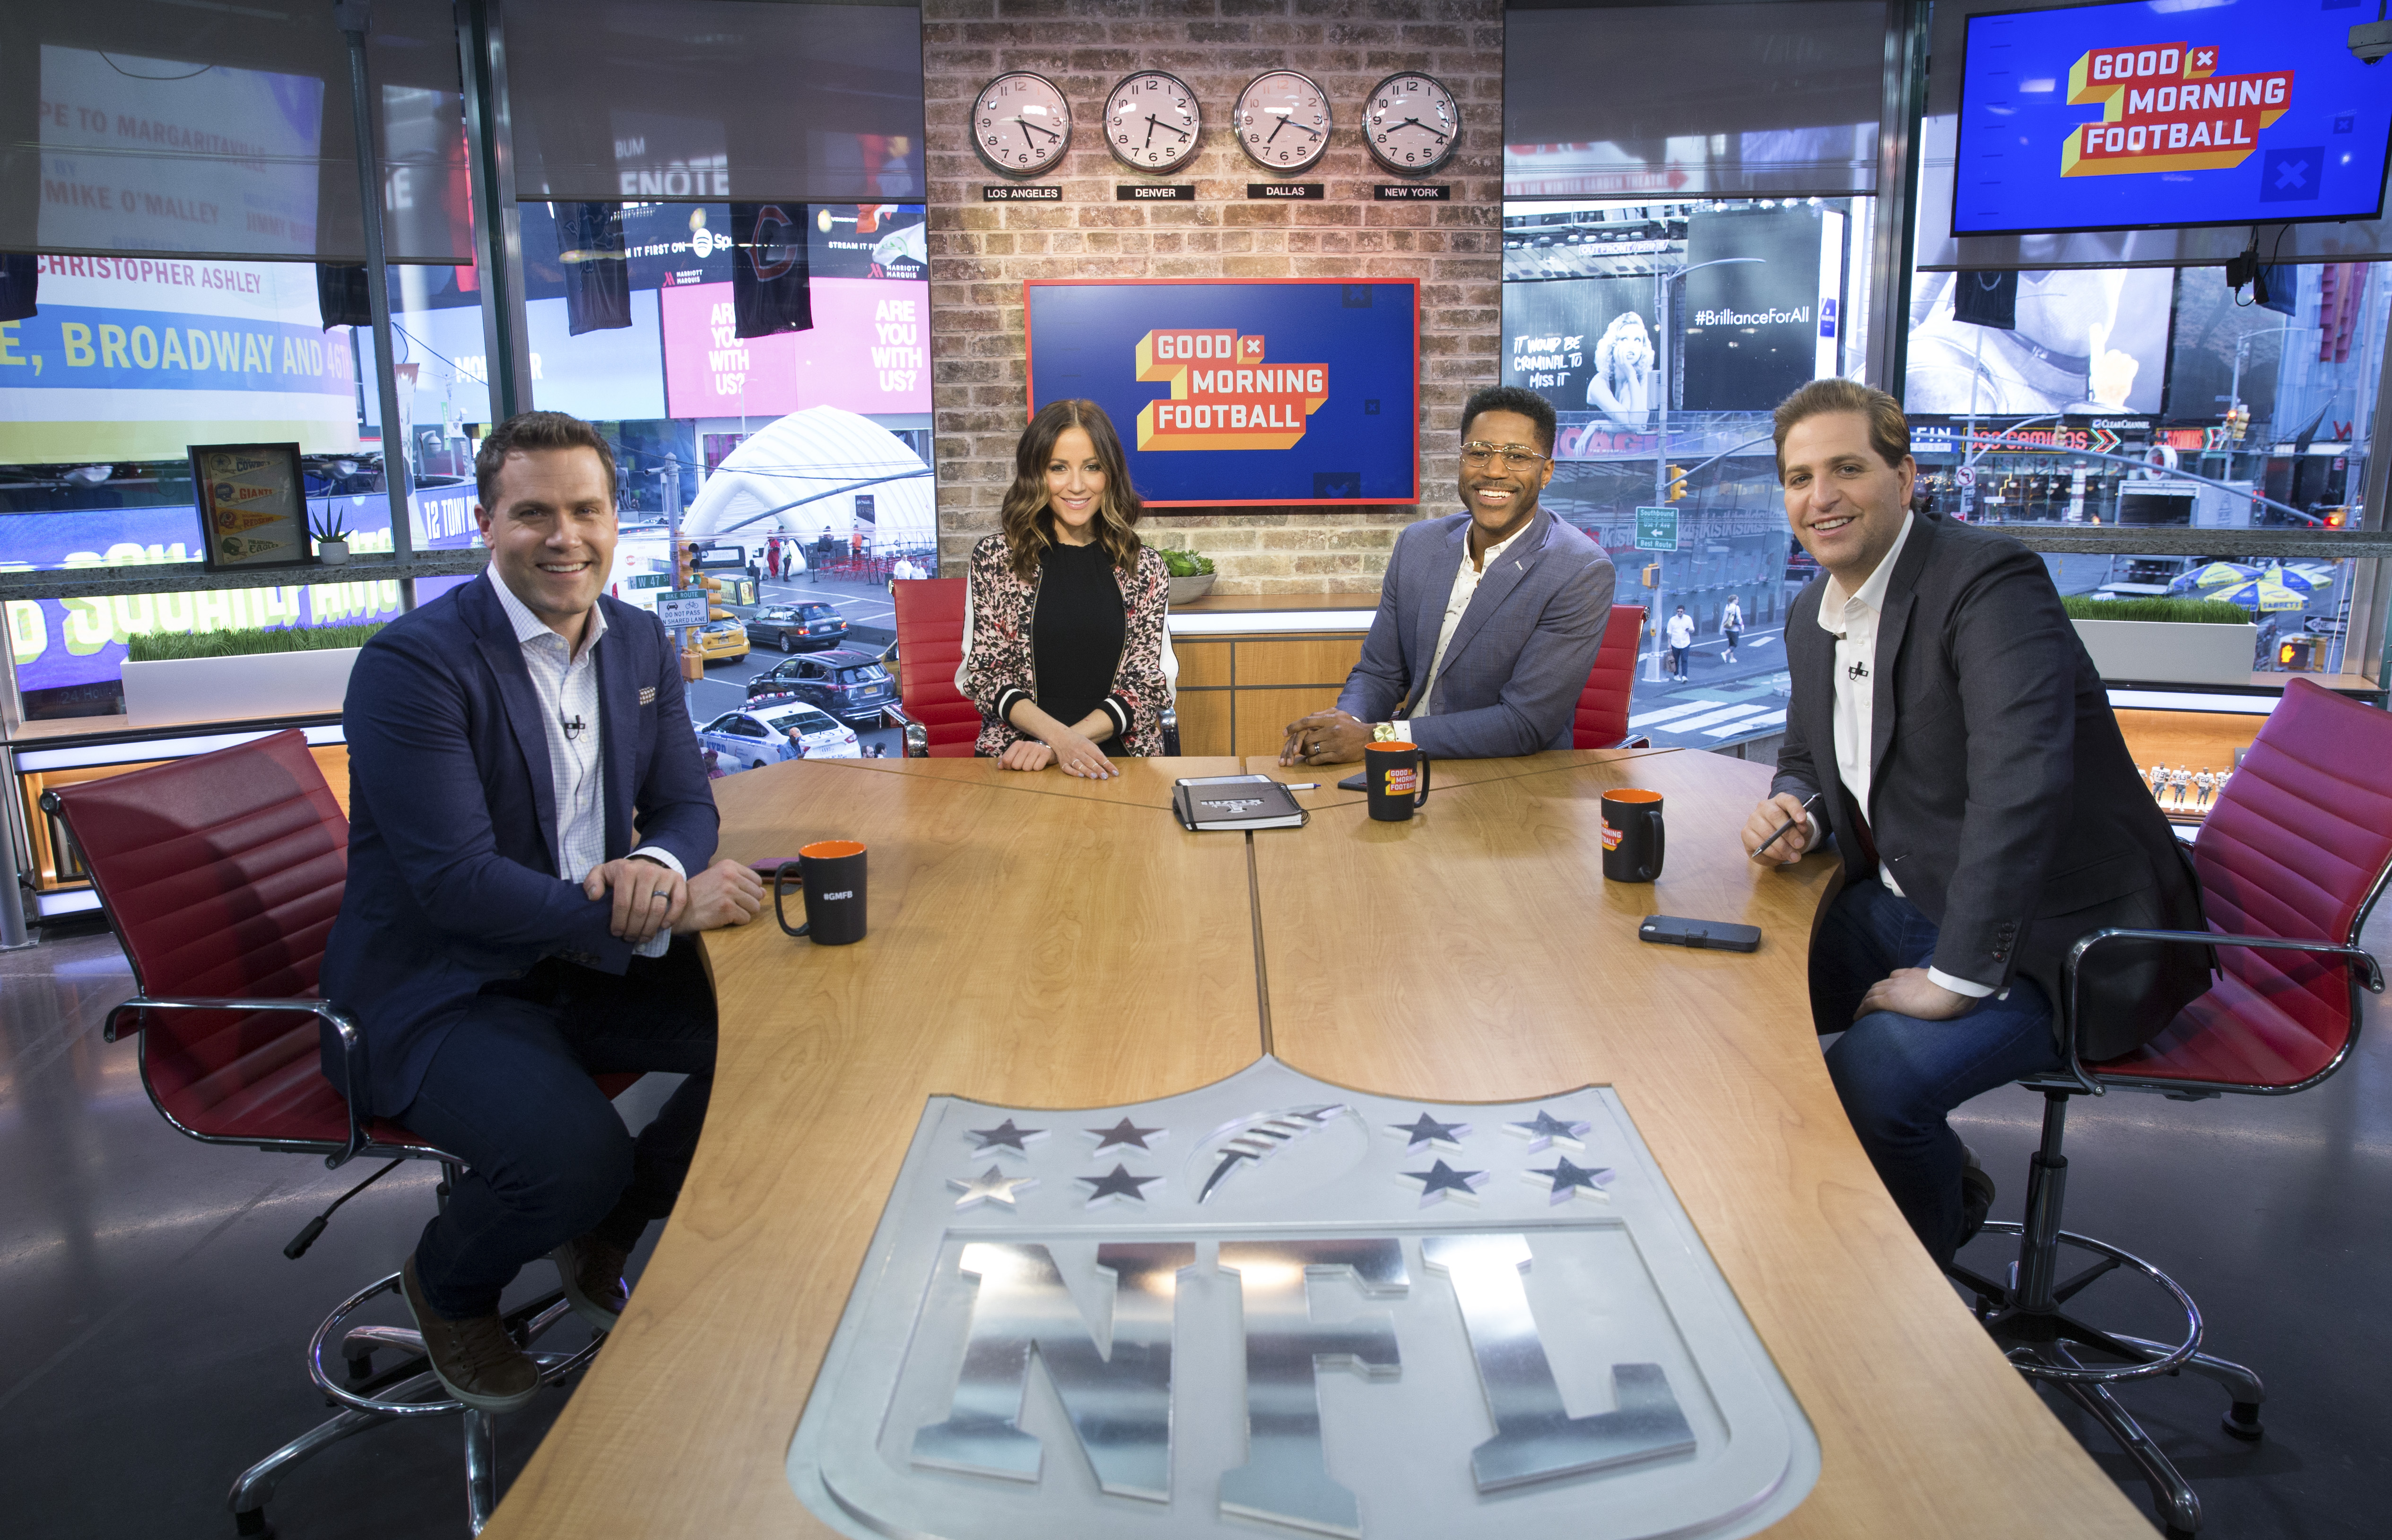 b2b1174c Good Morning Football' - NFL Network's diverse quartet mixes news ...